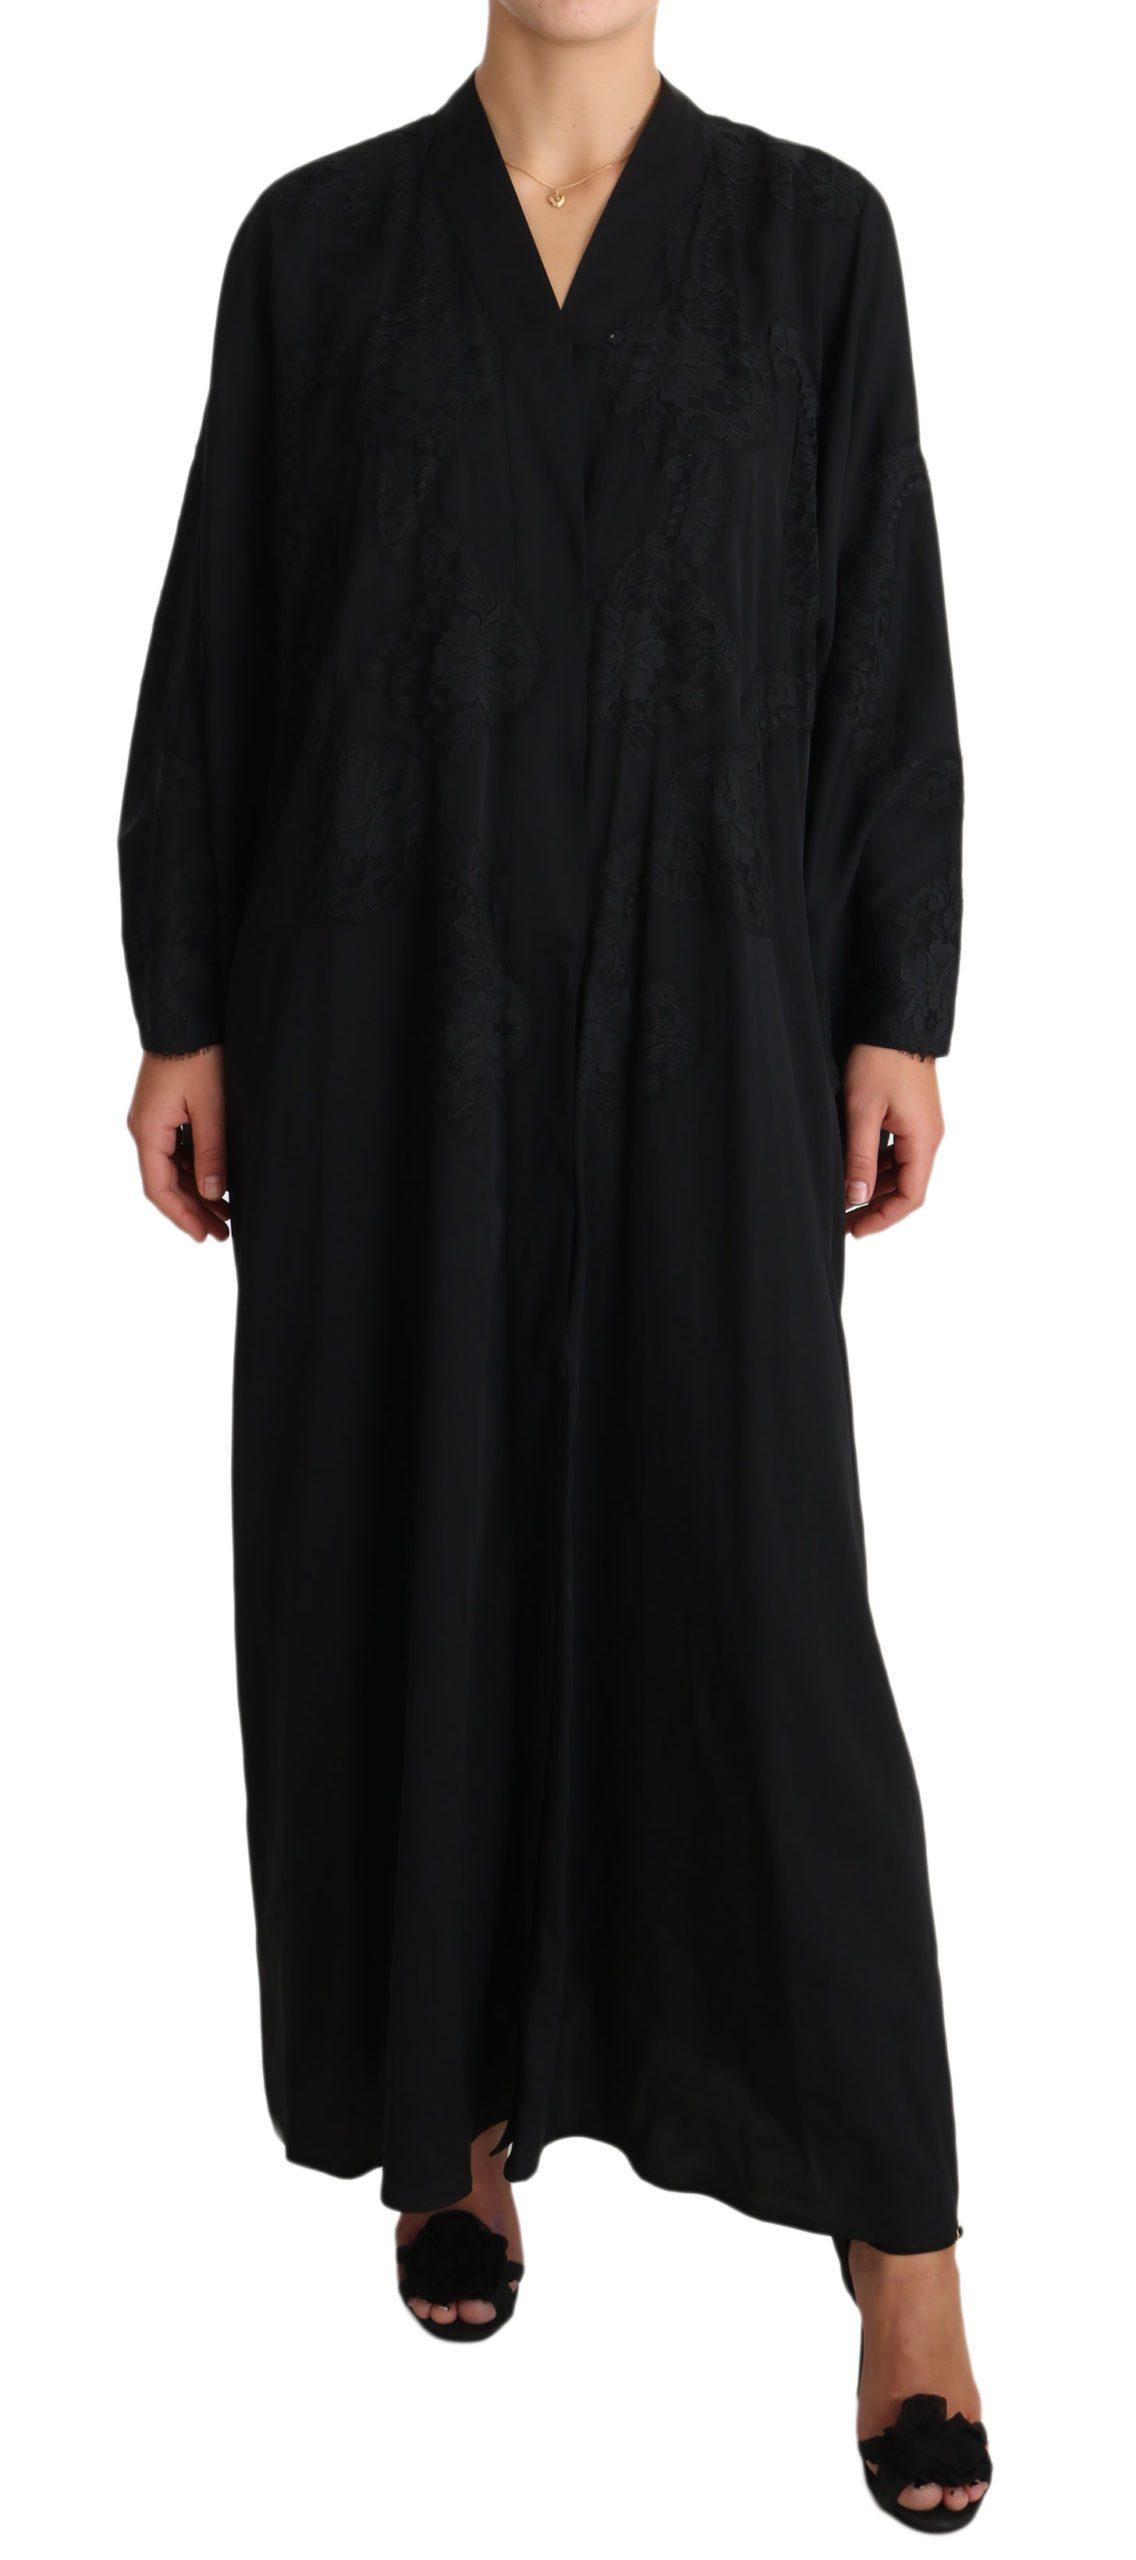 Dolce & Gabbana Women's Dress Black DR1902 - IT42 M